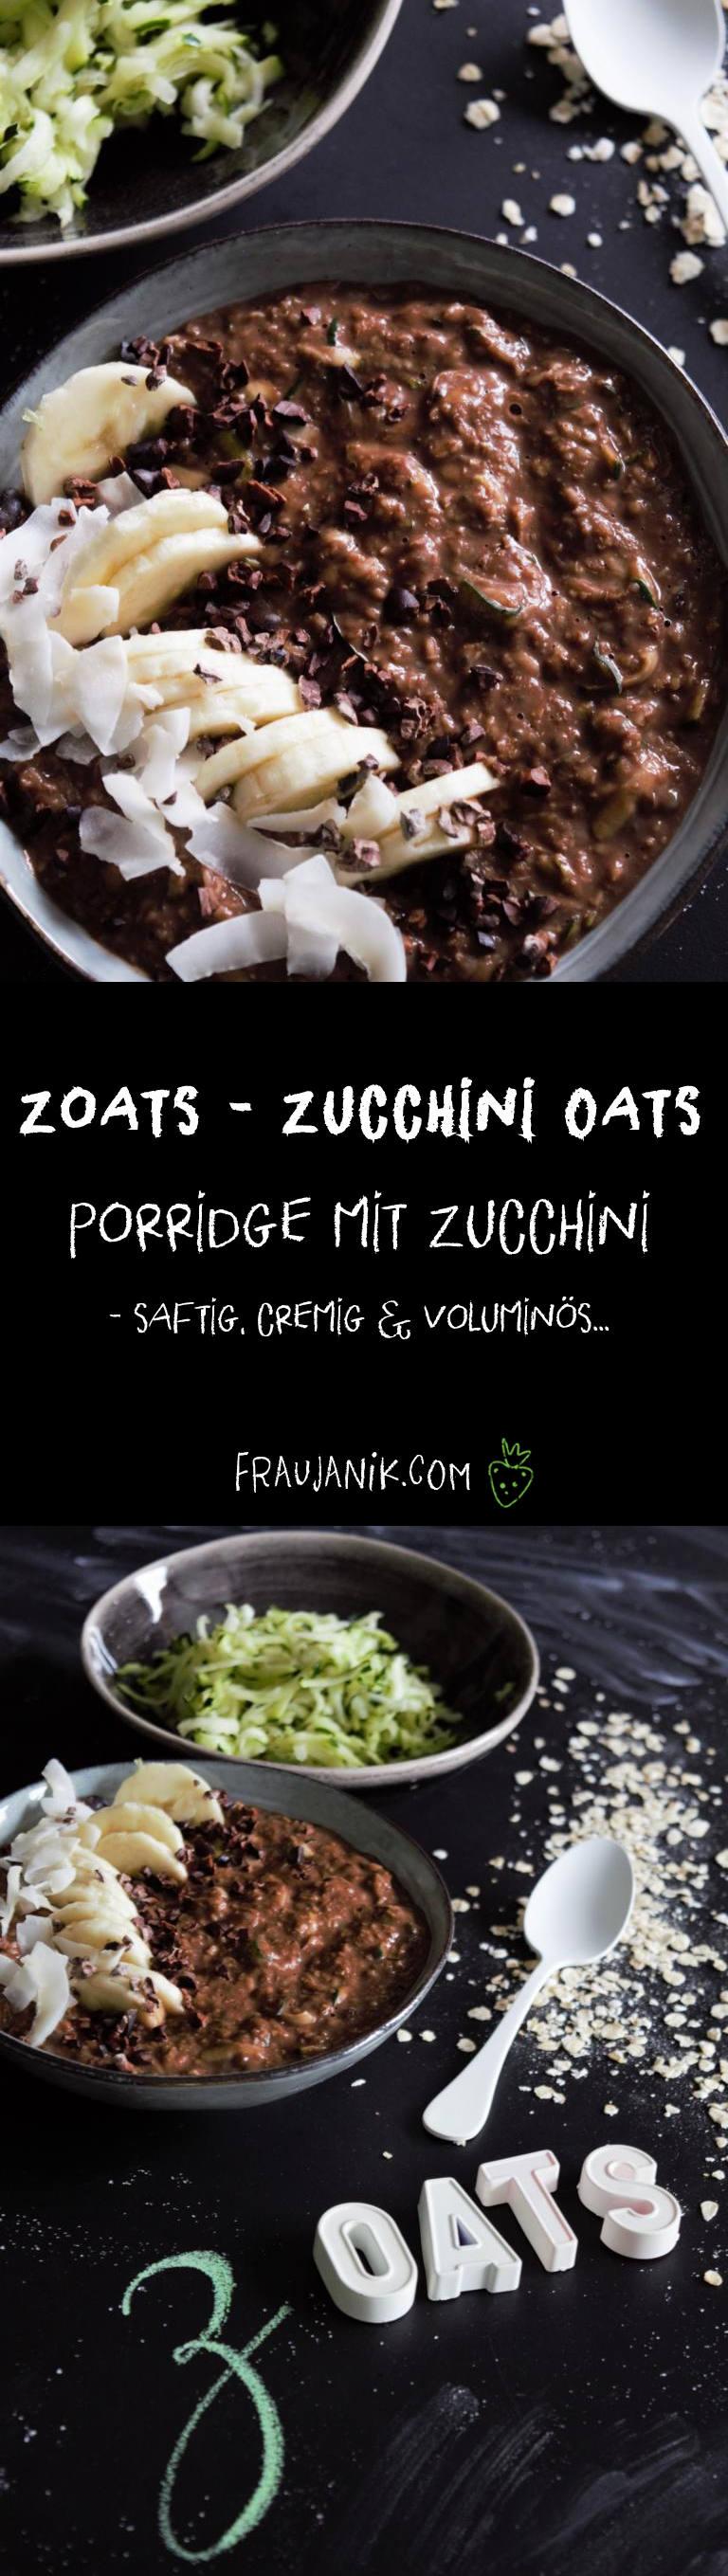 Zoats, zucchini oats, porridge mit Zucchini